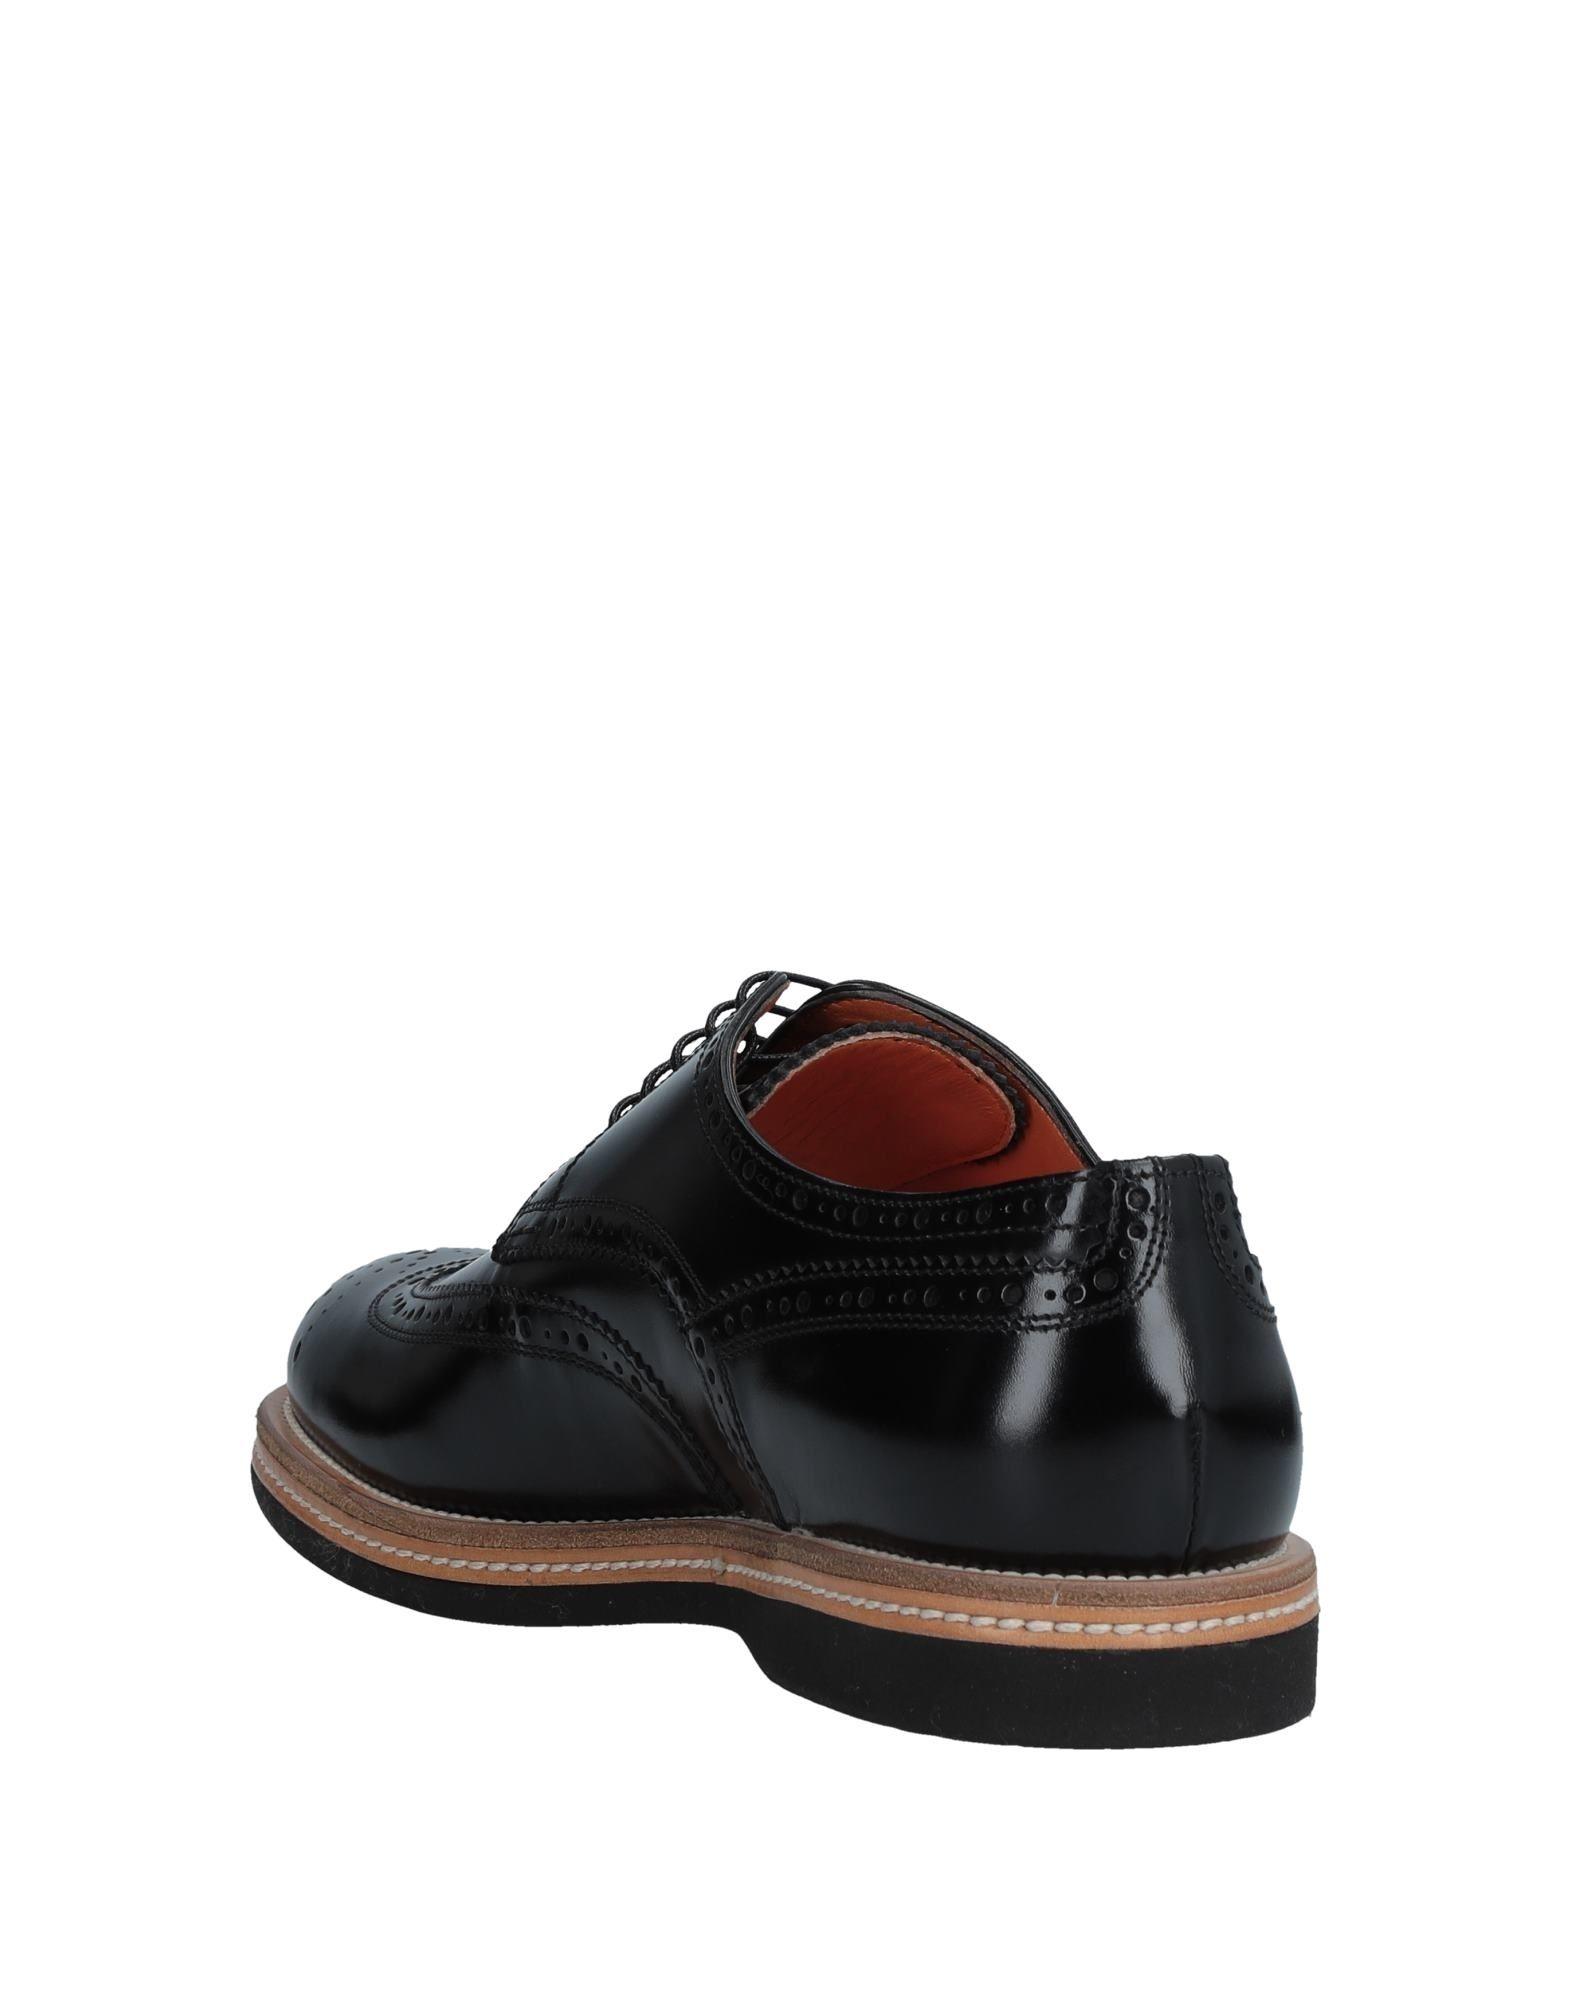 Santoni Schnürschuhe Herren  Schuhe 11542160EP Gute Qualität beliebte Schuhe  eb892d